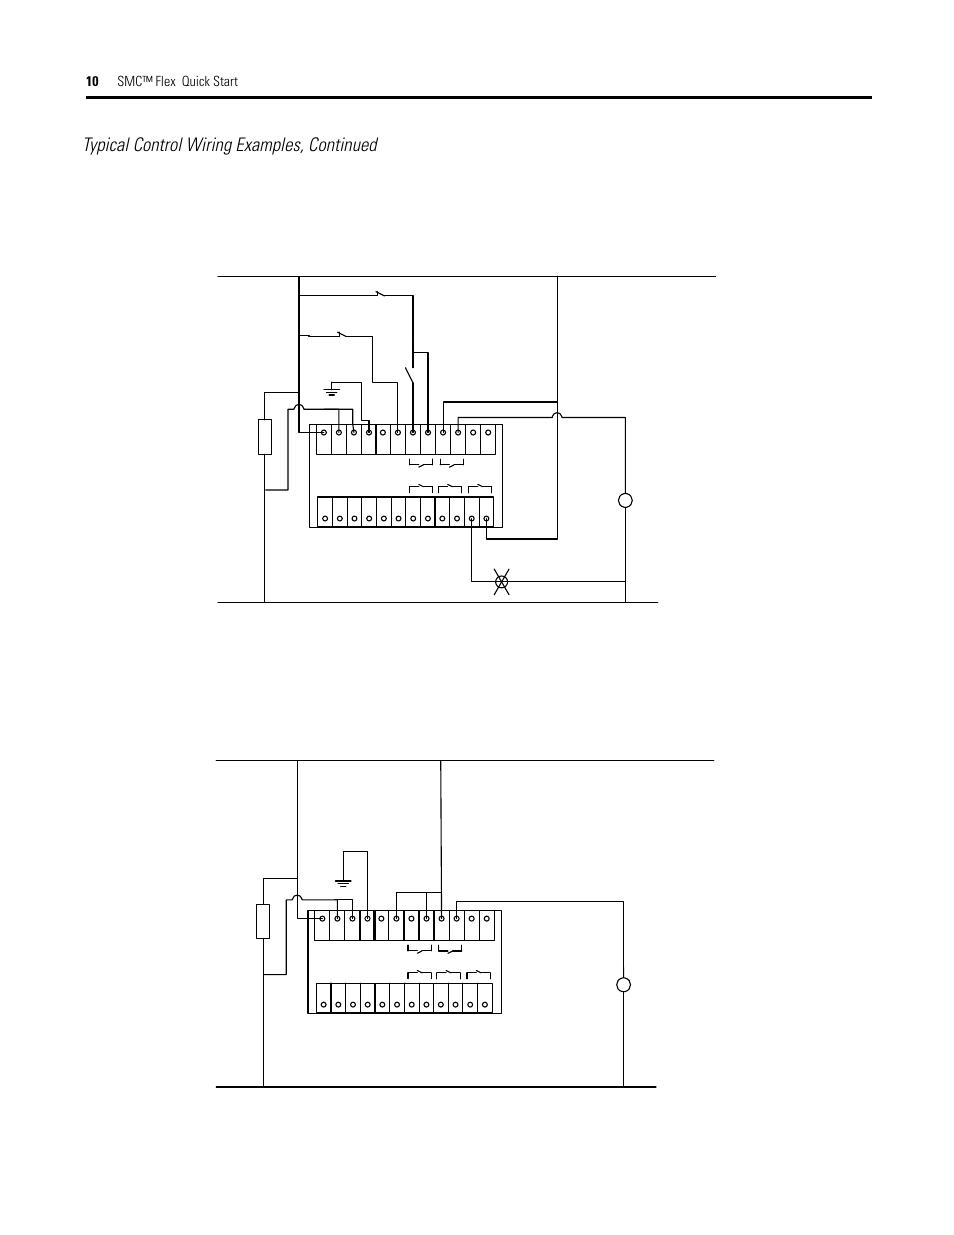 Smc Wiring Diagrams 3 - Reversing Switch Wiring Diagram for Wiring Diagram  SchematicsWiring Diagram Schematics